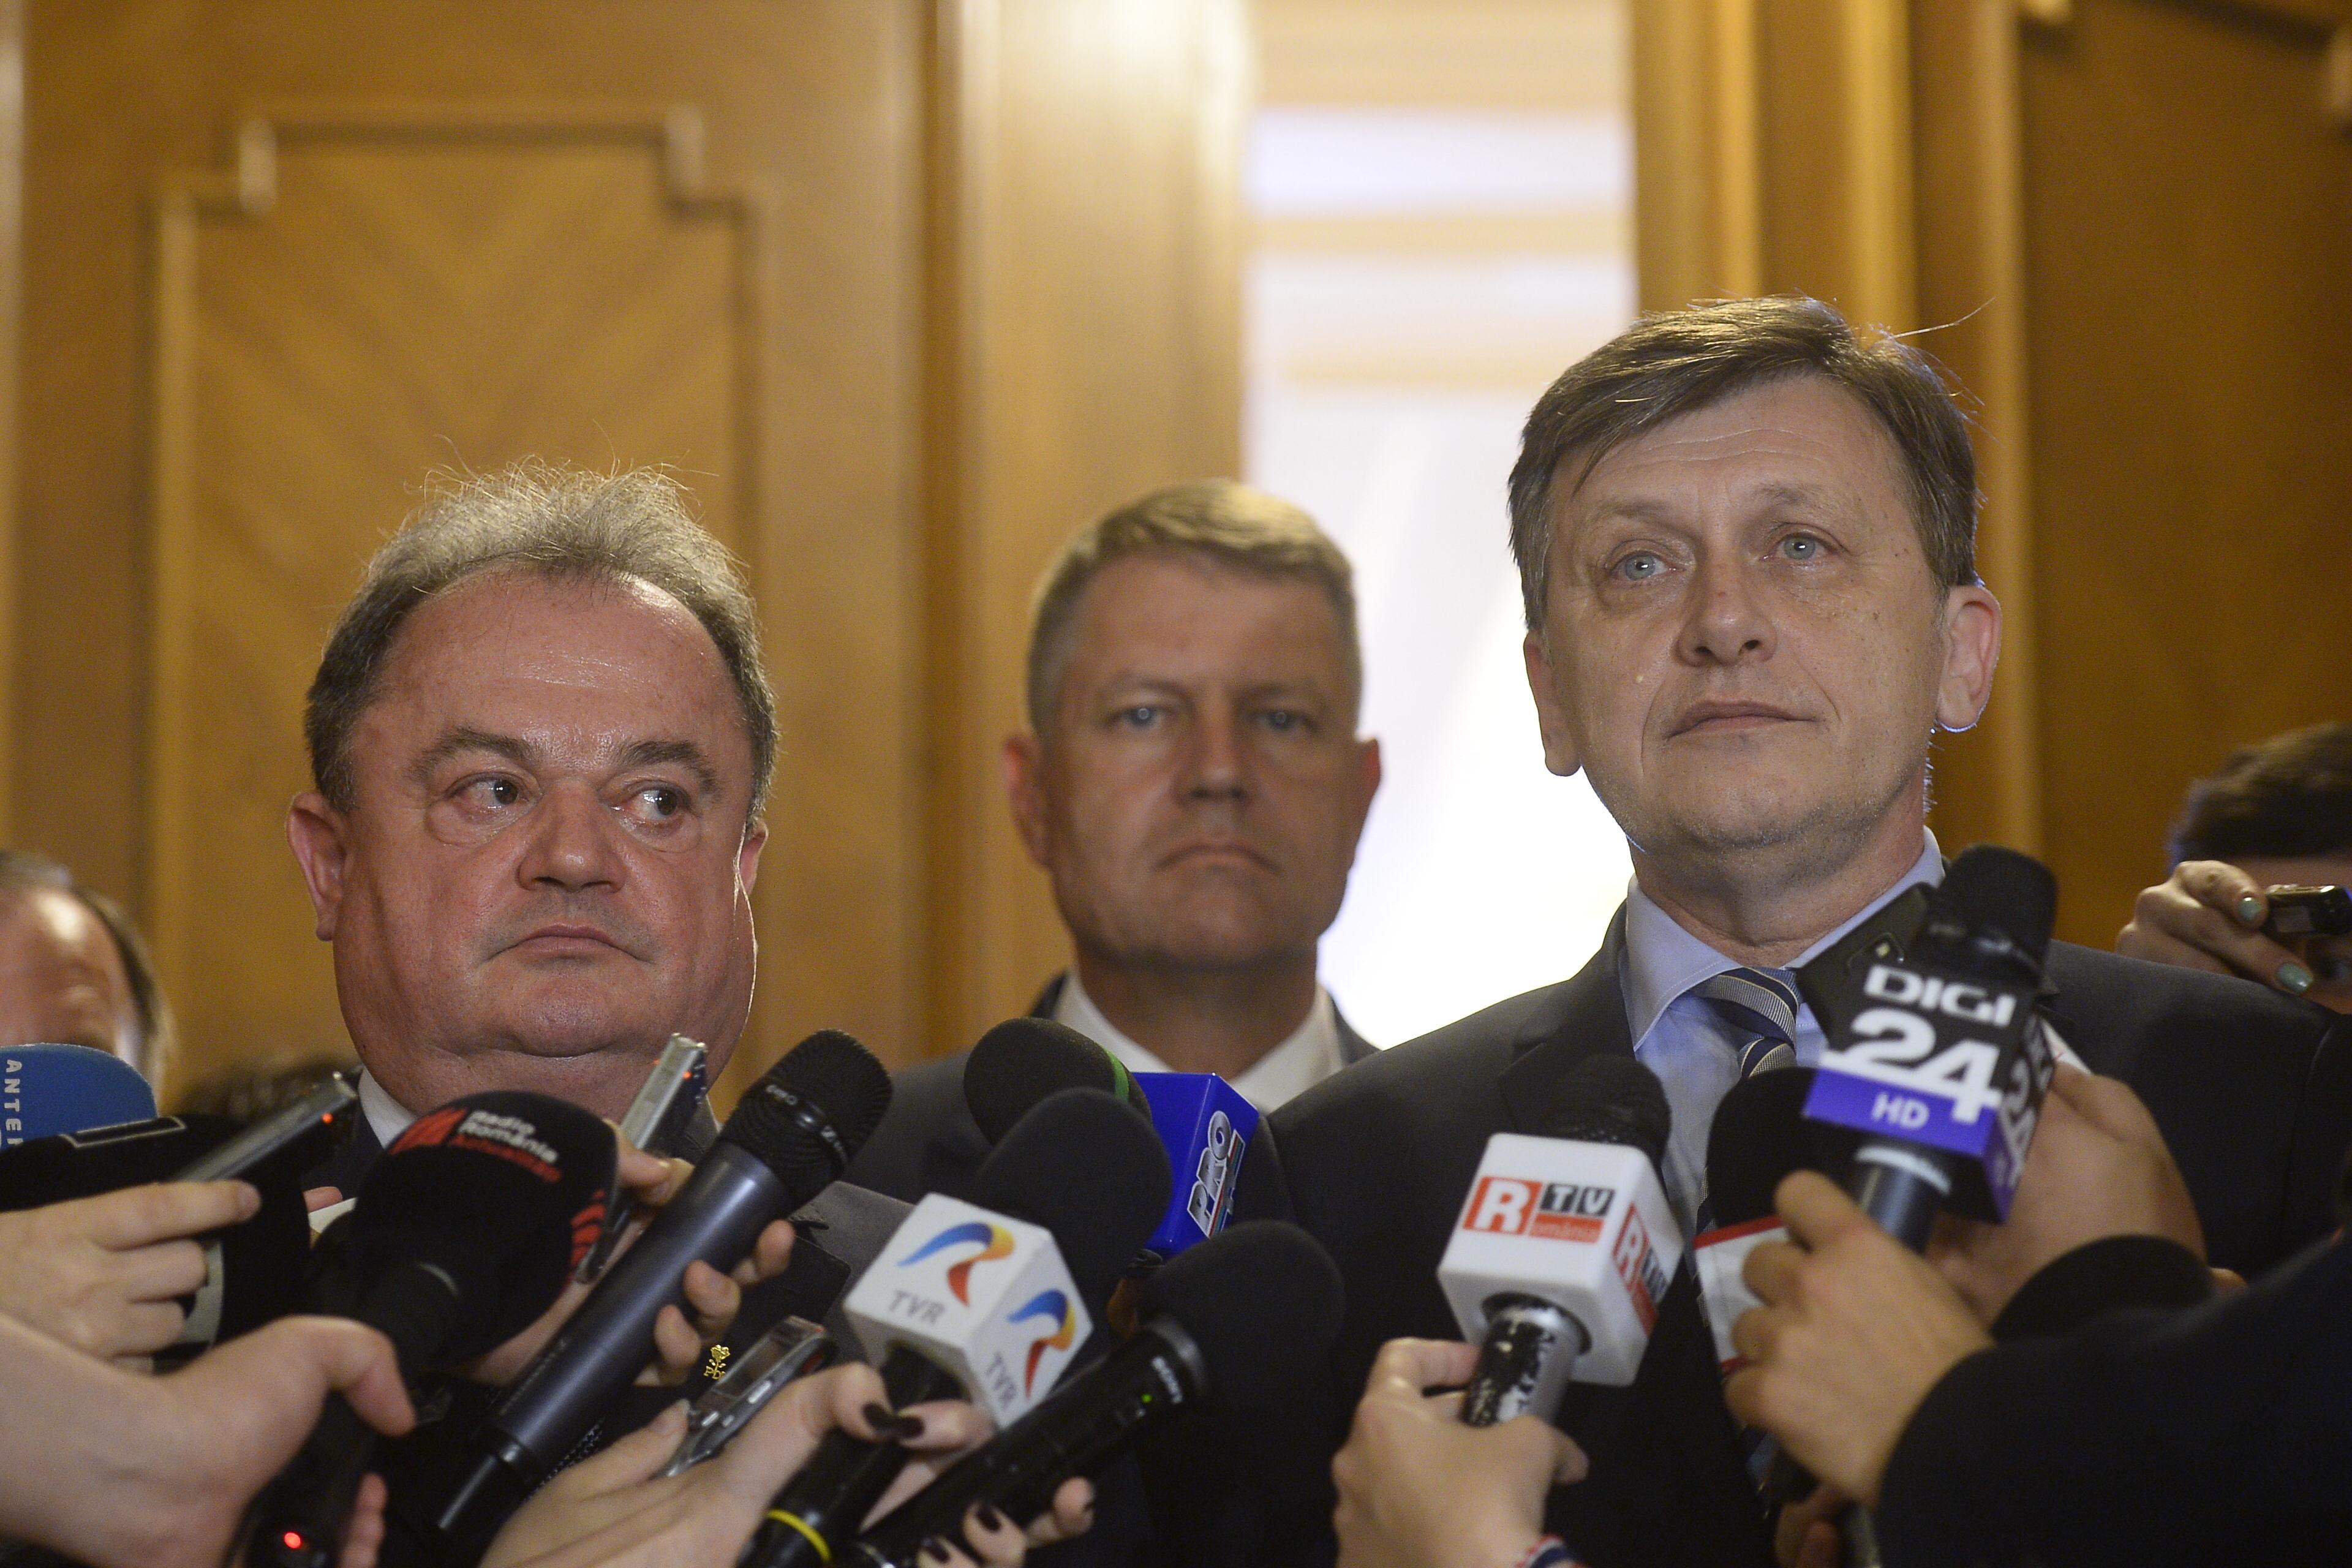 PDL decide fuziunea cu PNL in unaniminate. Prezidentiabilul dreptei, stabilit pana cel tarziu la 1 august